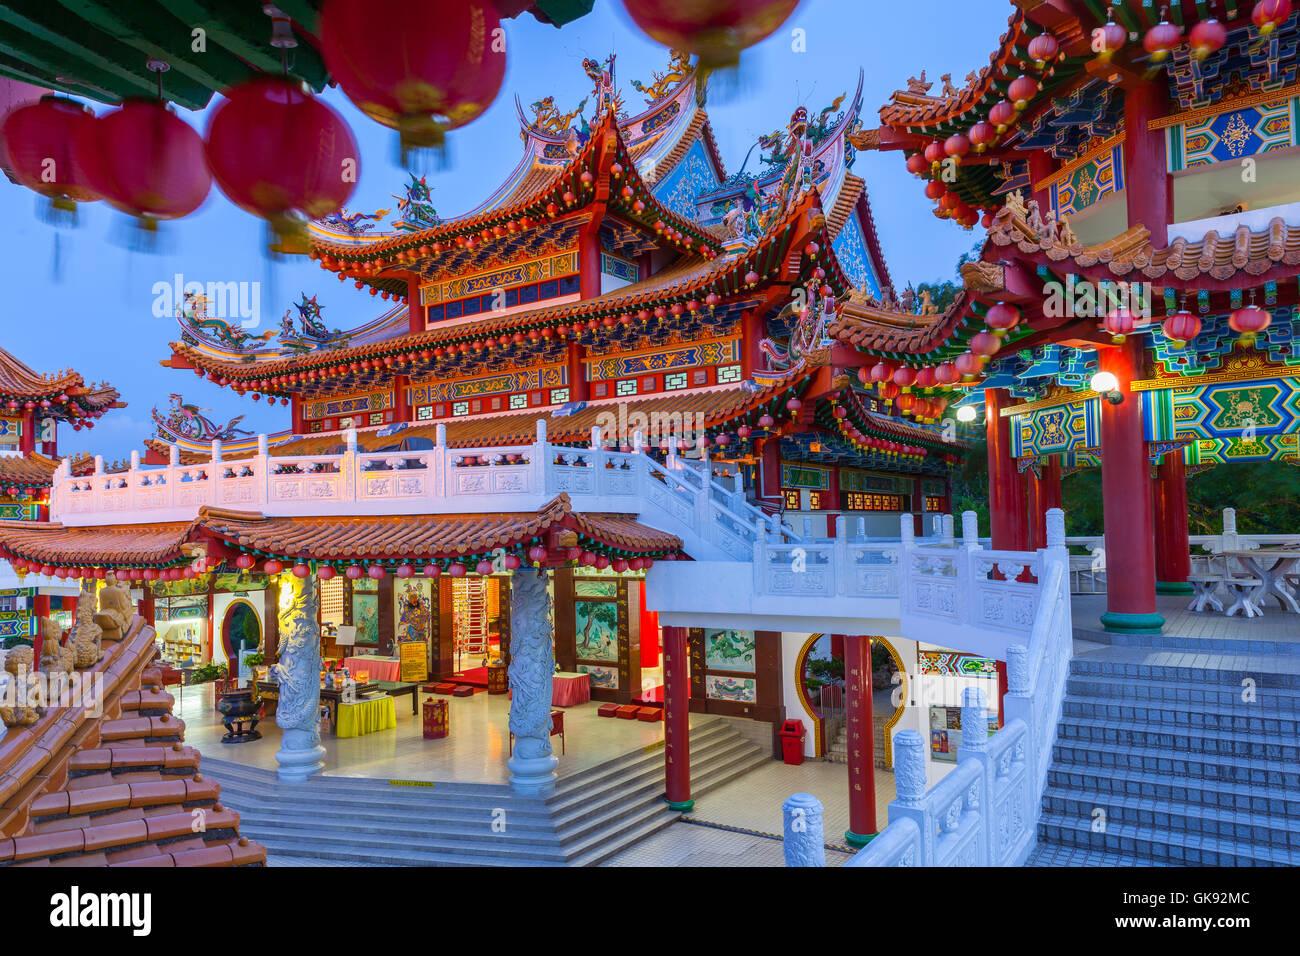 Thean Hou tempio Buddista al crepuscolo, Kuala Lumpur, Malesia Immagini Stock